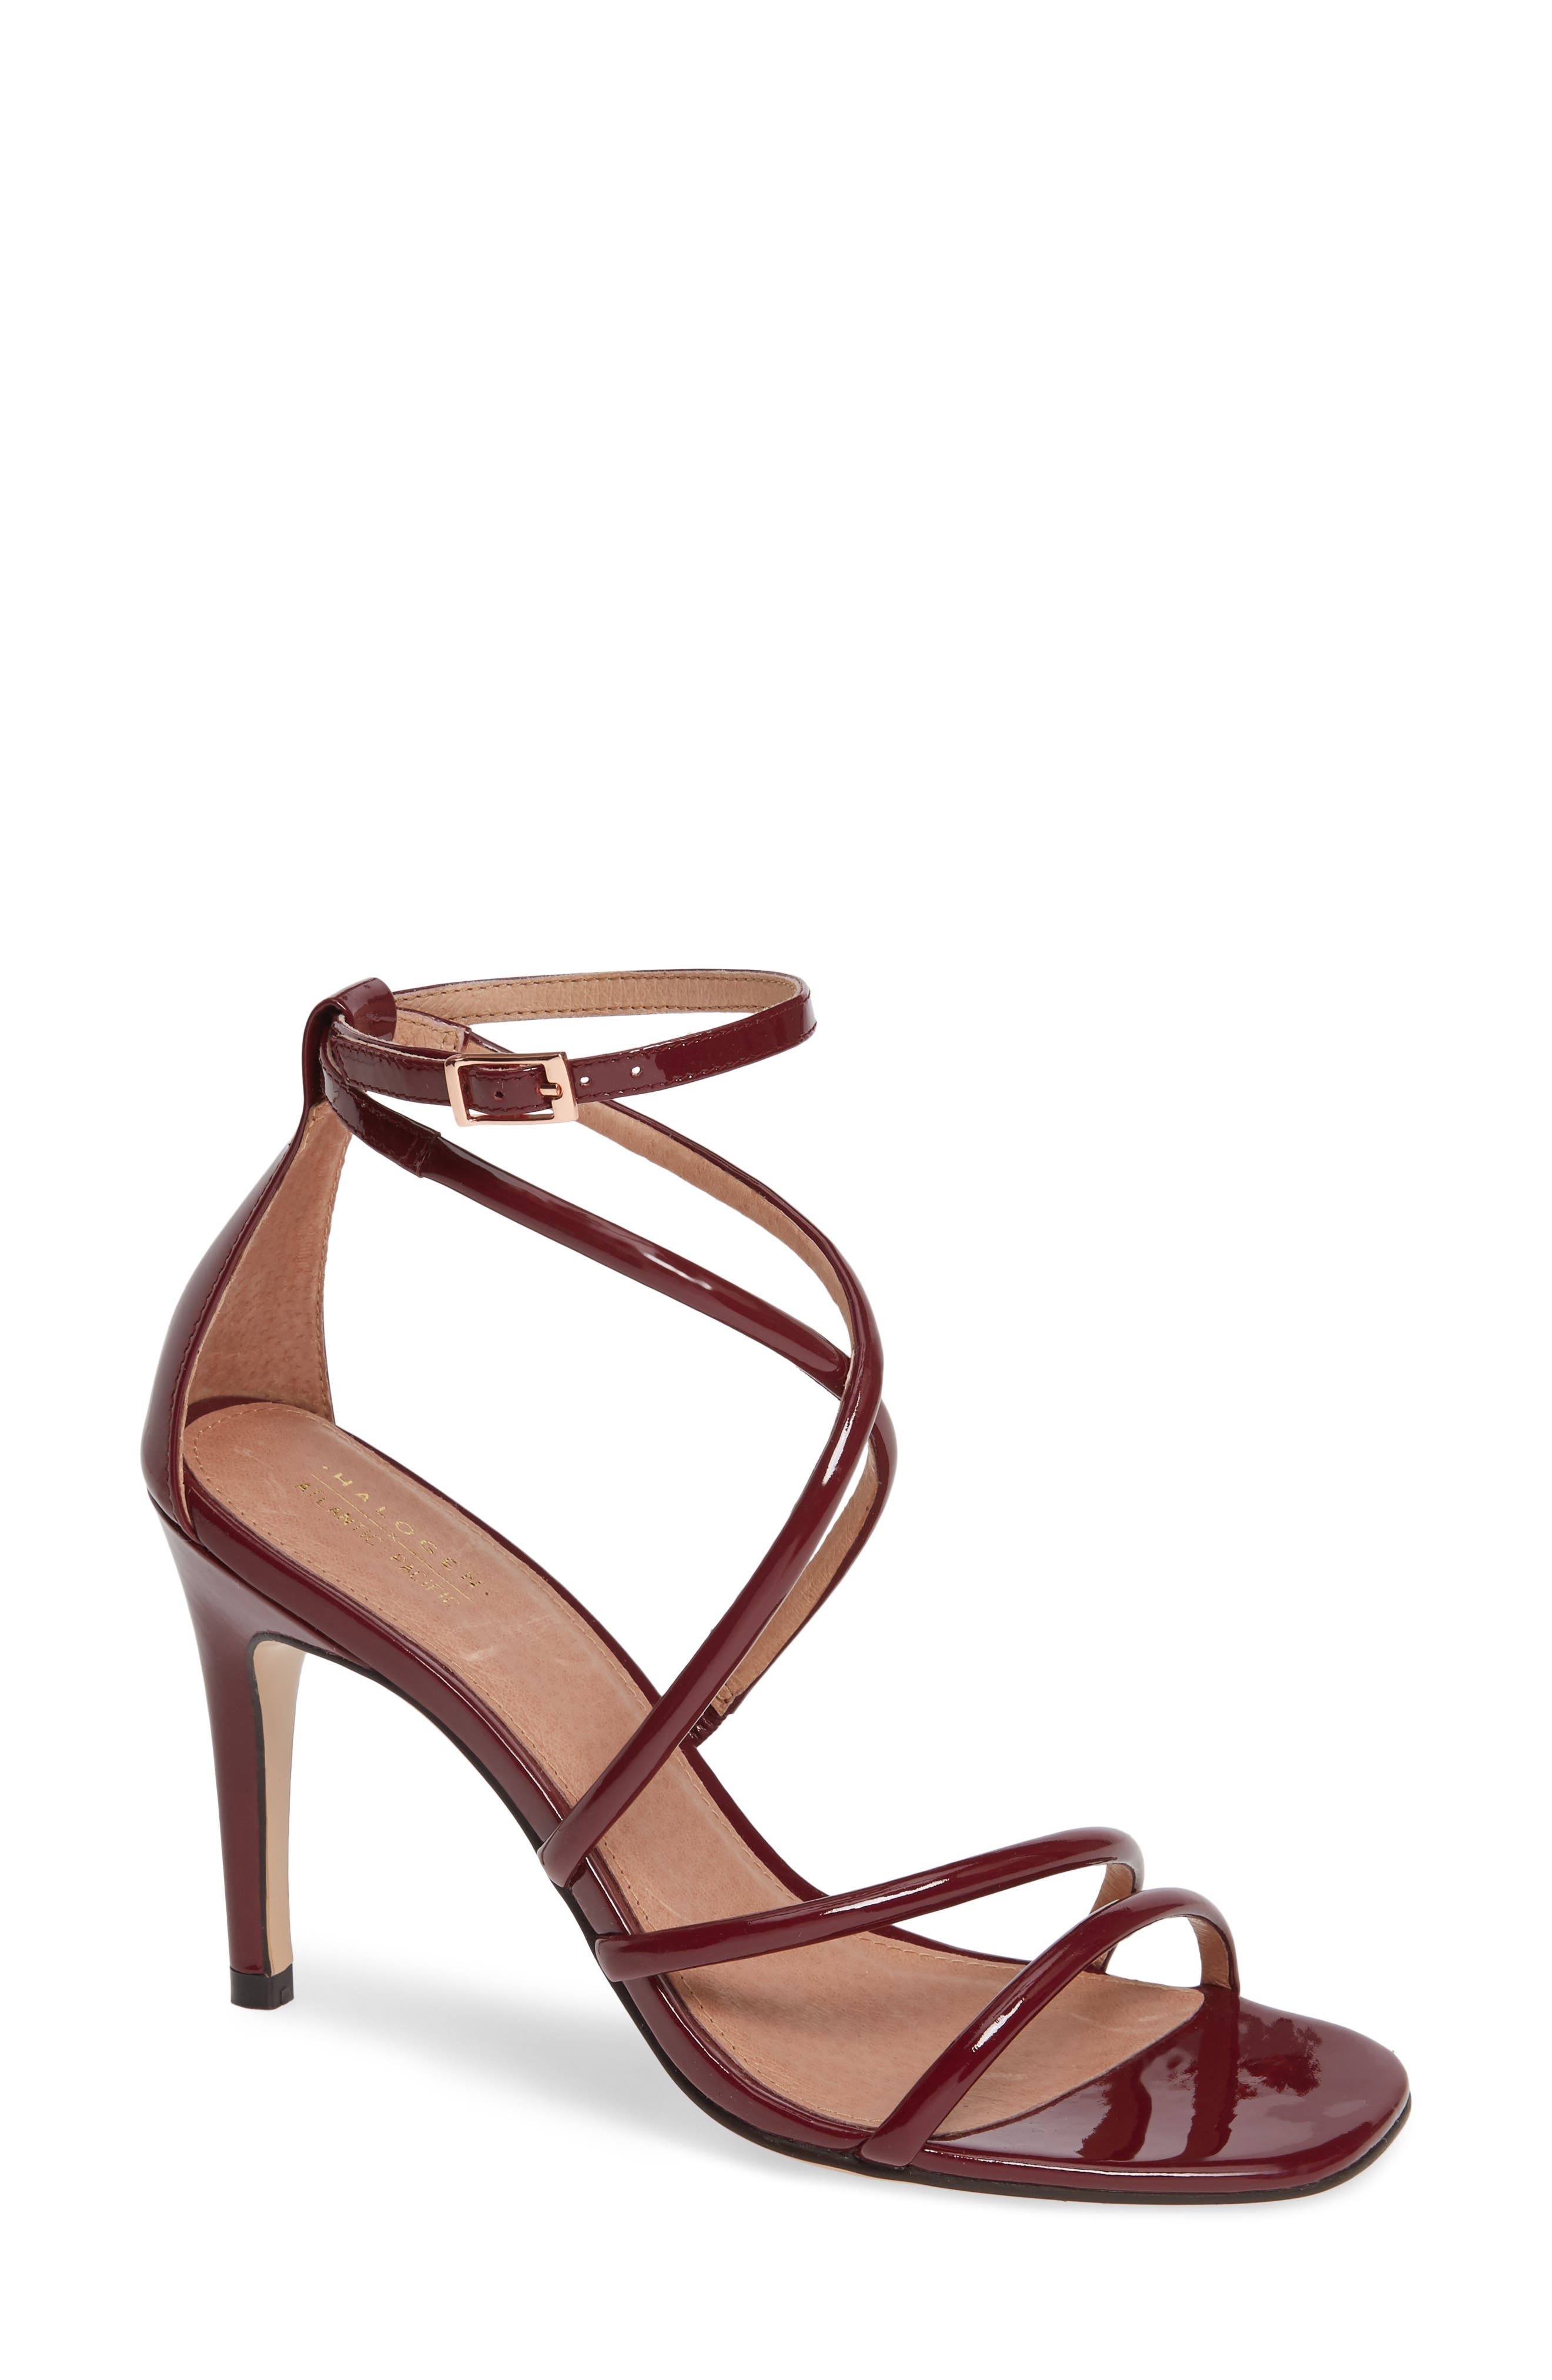 x Atlantic-Pacific Violetta Multi Strap Sandal,                             Main thumbnail 1, color,                             MERLOT PATENT